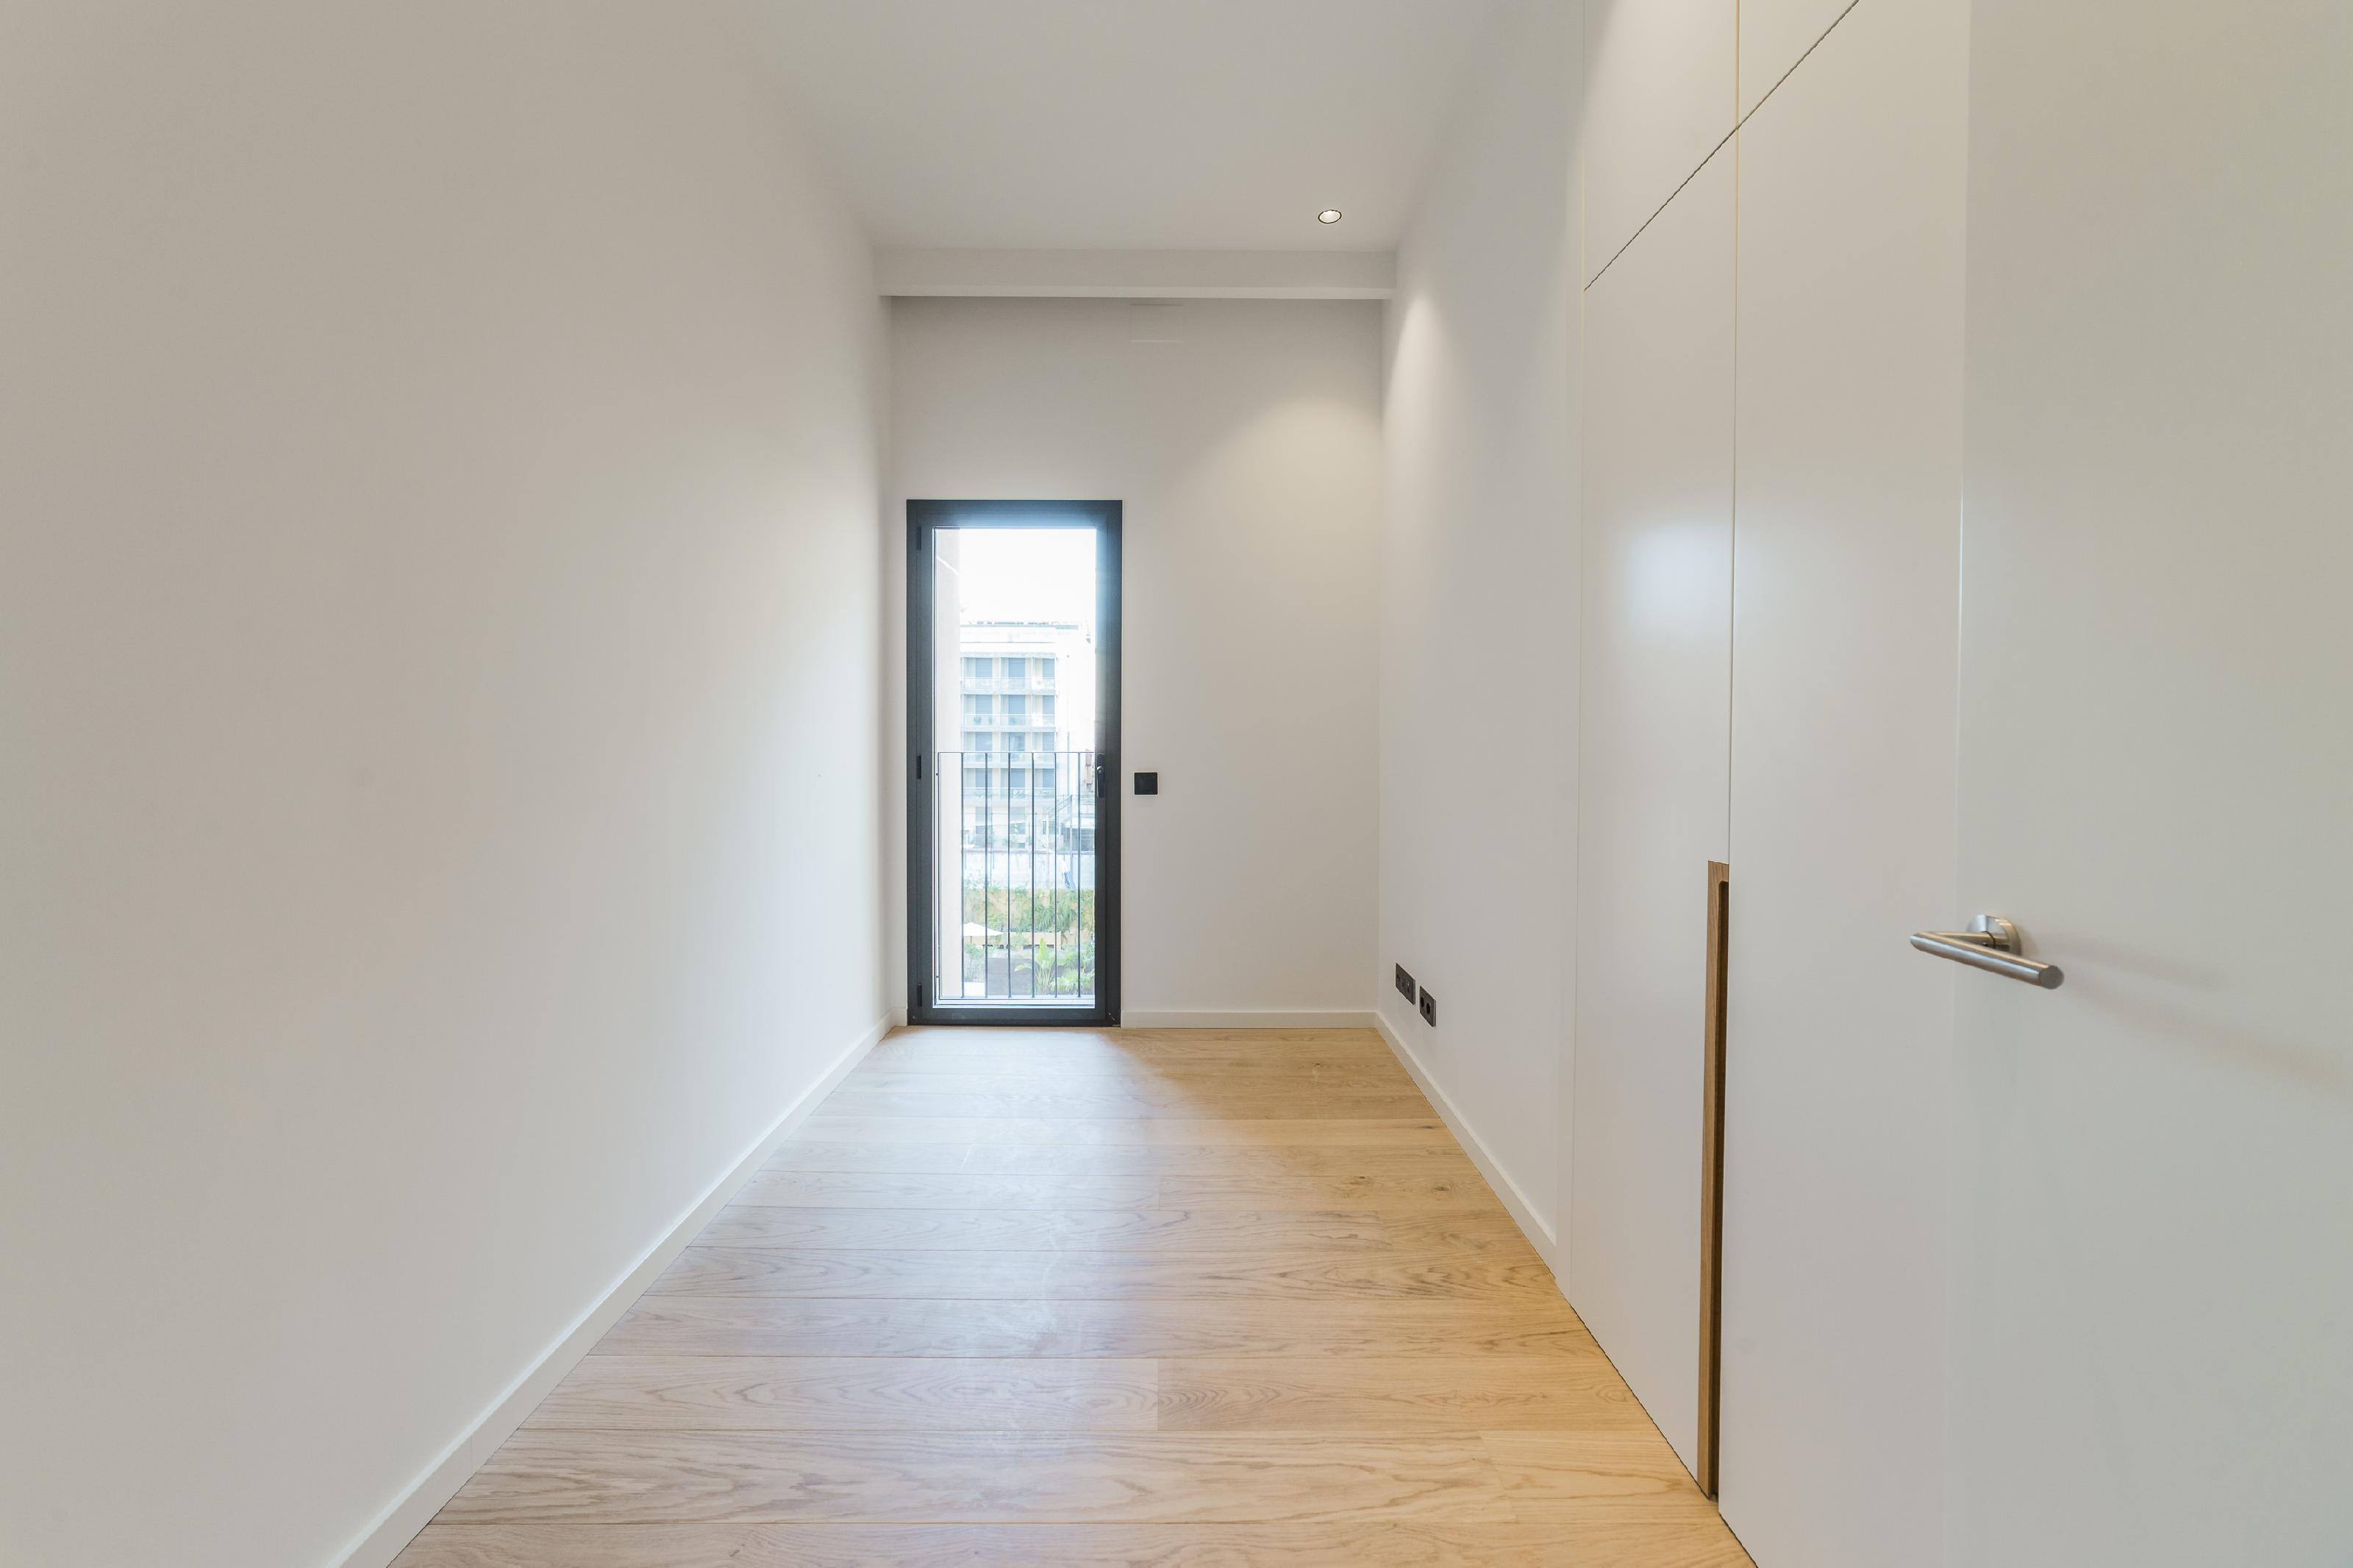 182456 Apartamento en venda en Eixample, Antiga Esquerre Eixample 23